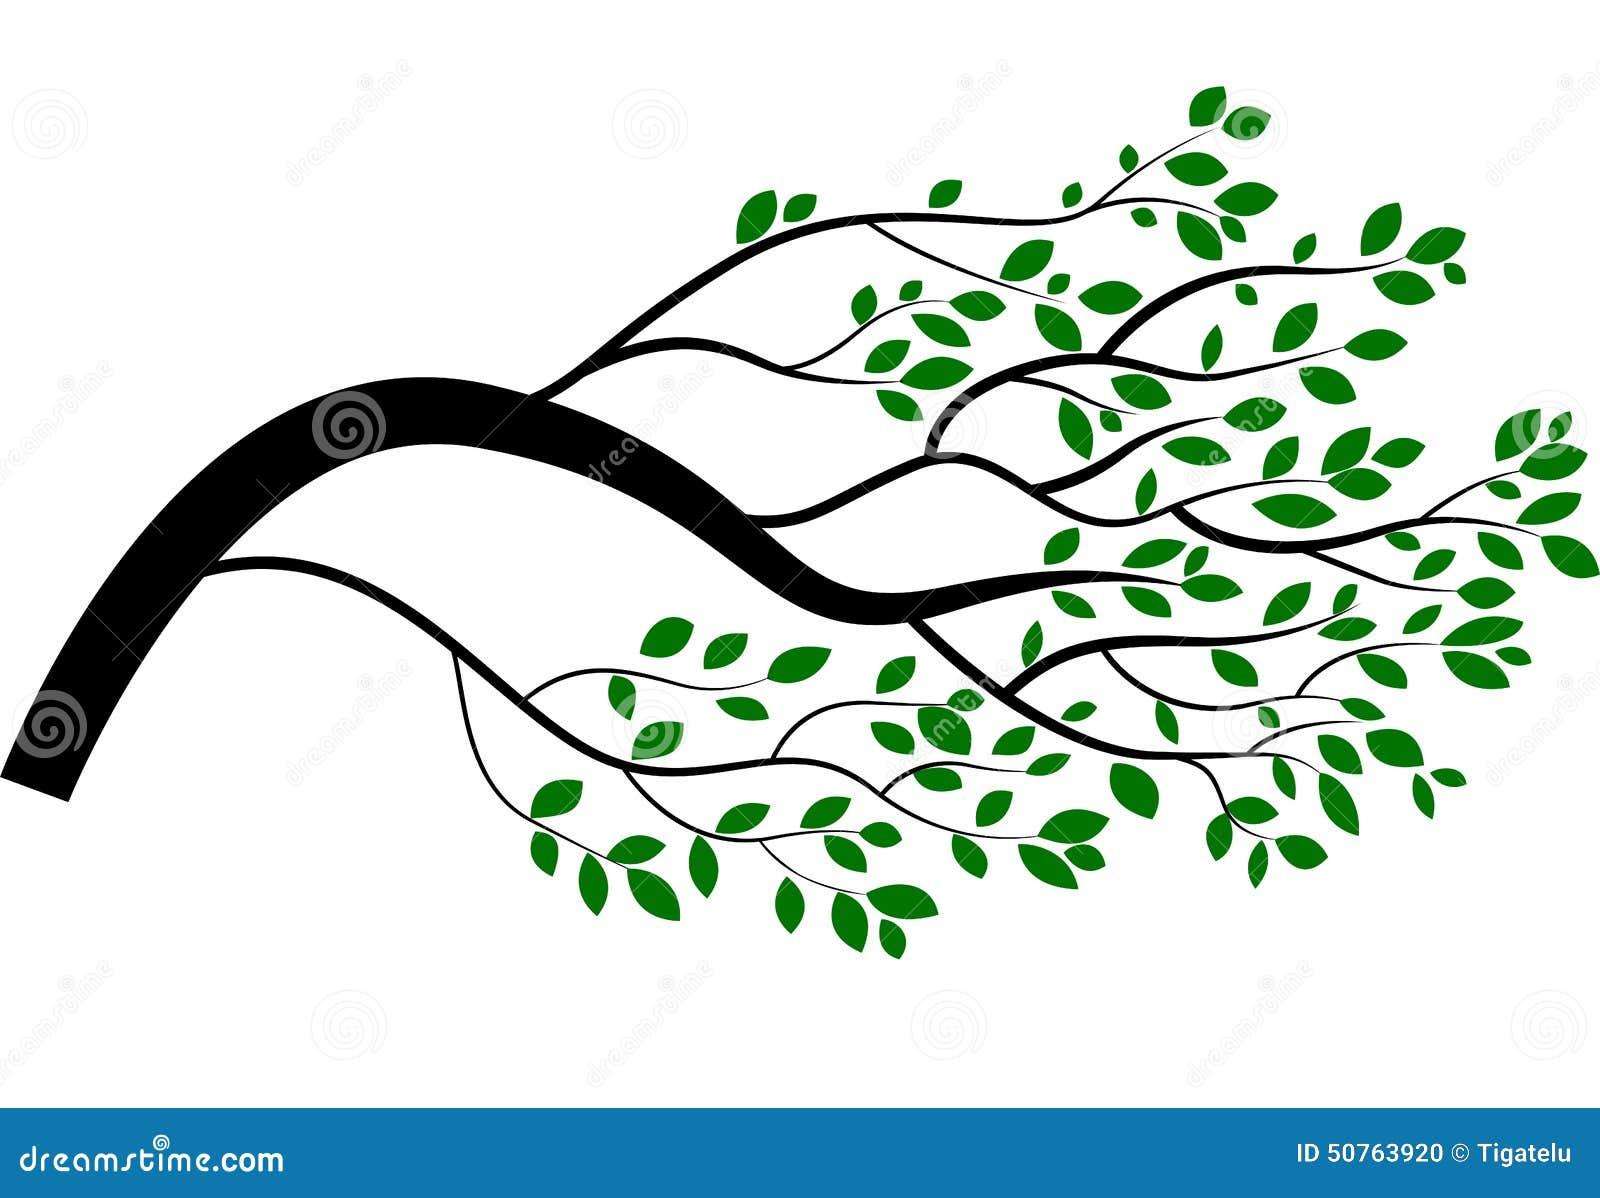 Cartoon Tree Branch Stock Illustration - Image: 50763920